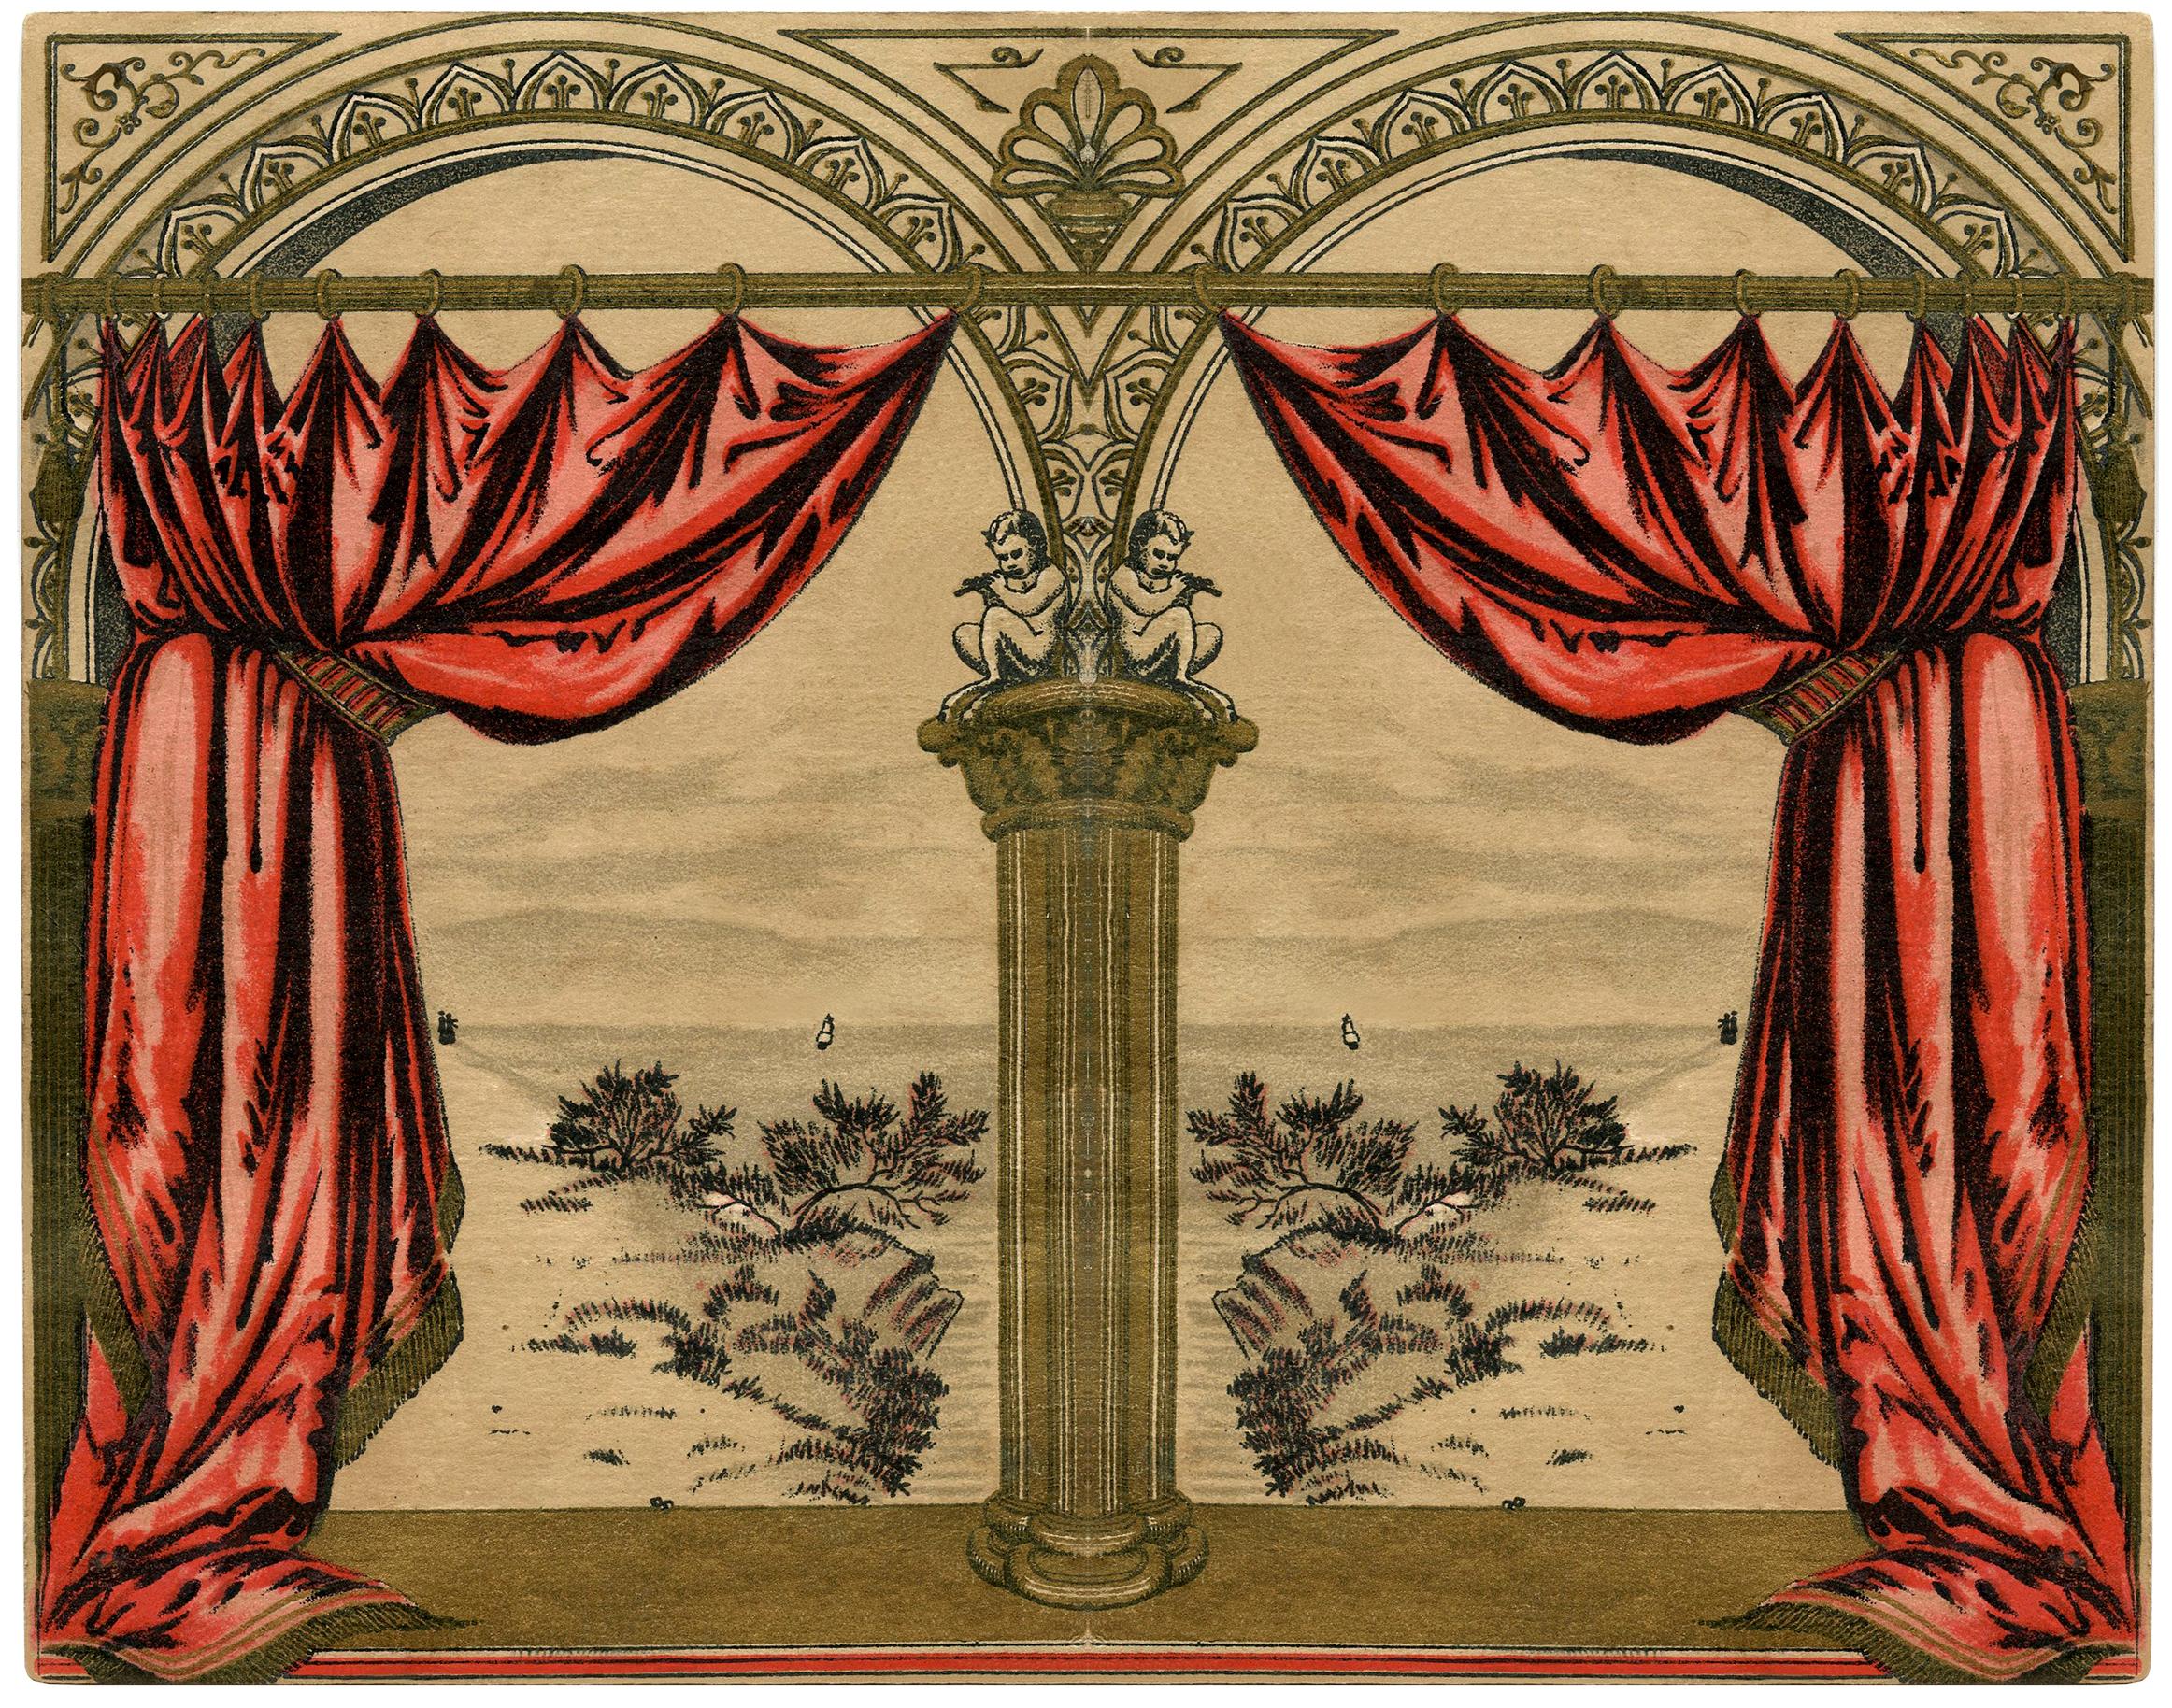 Vintage Curtains - Vintage red drapes image